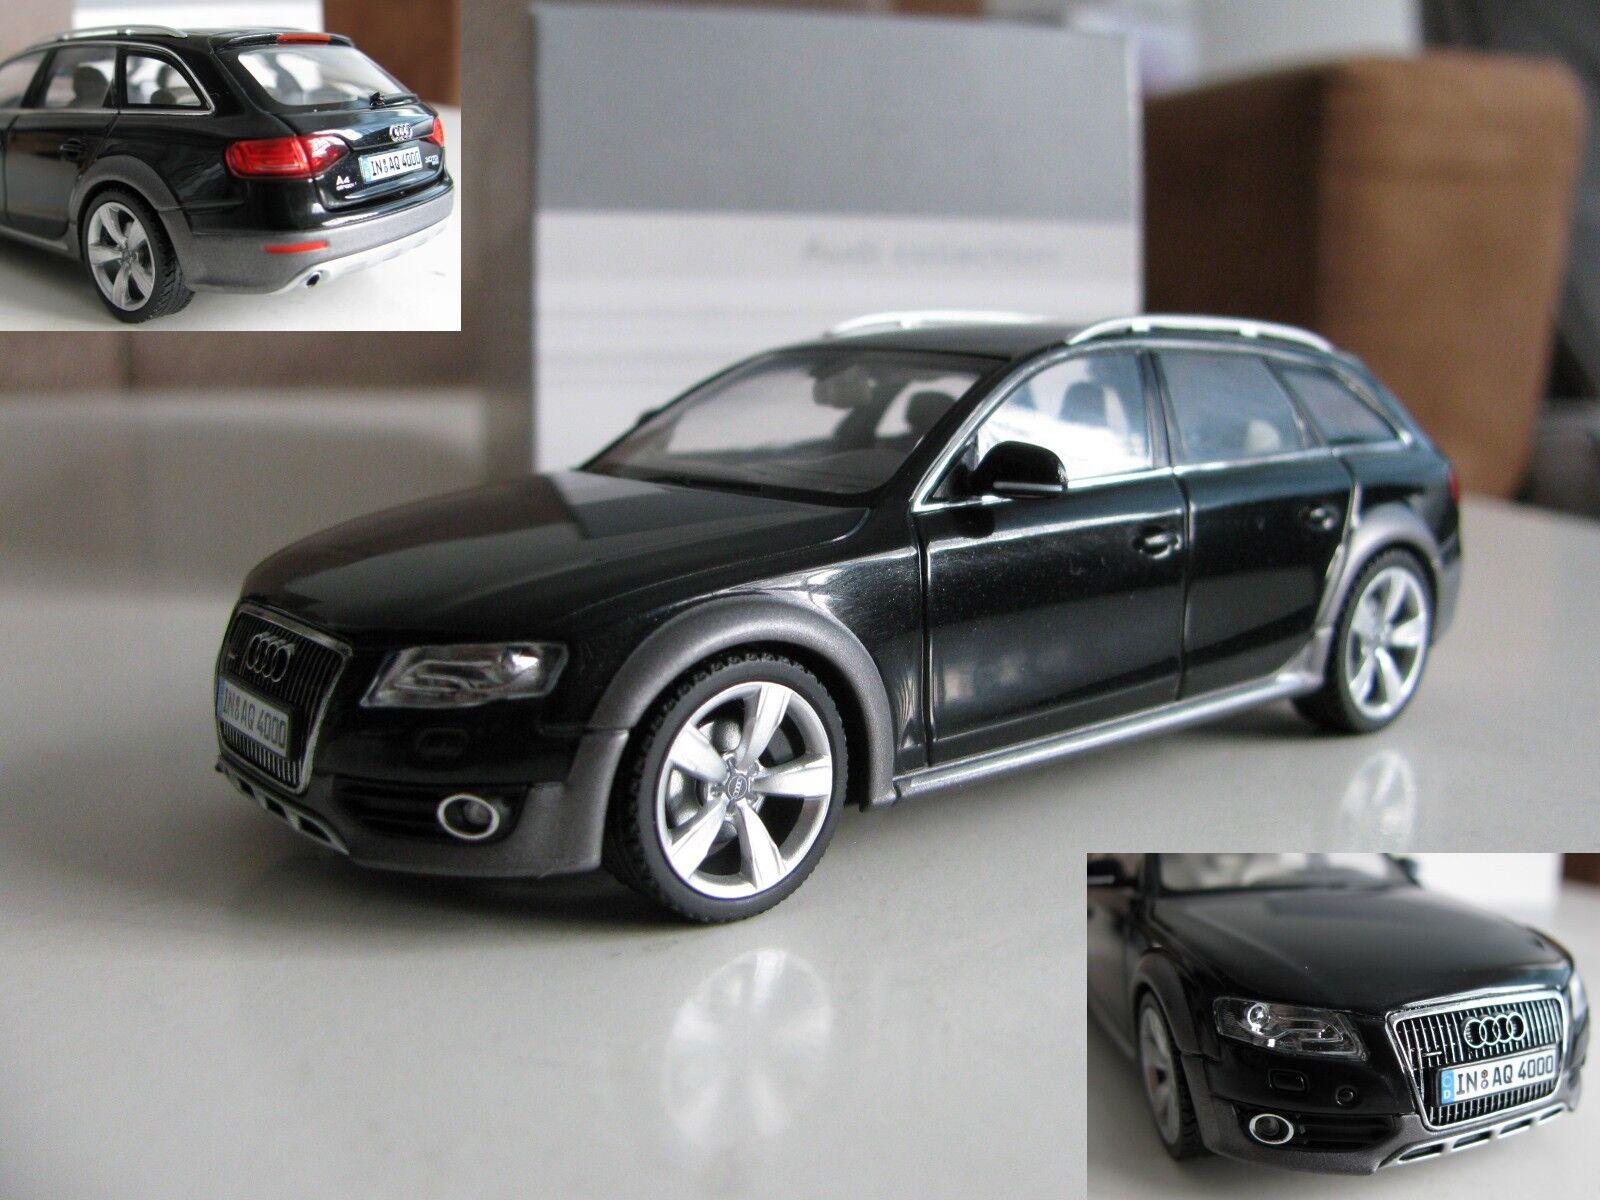 1 43 Schuco Audi A4 allroad diecast (dealer version)